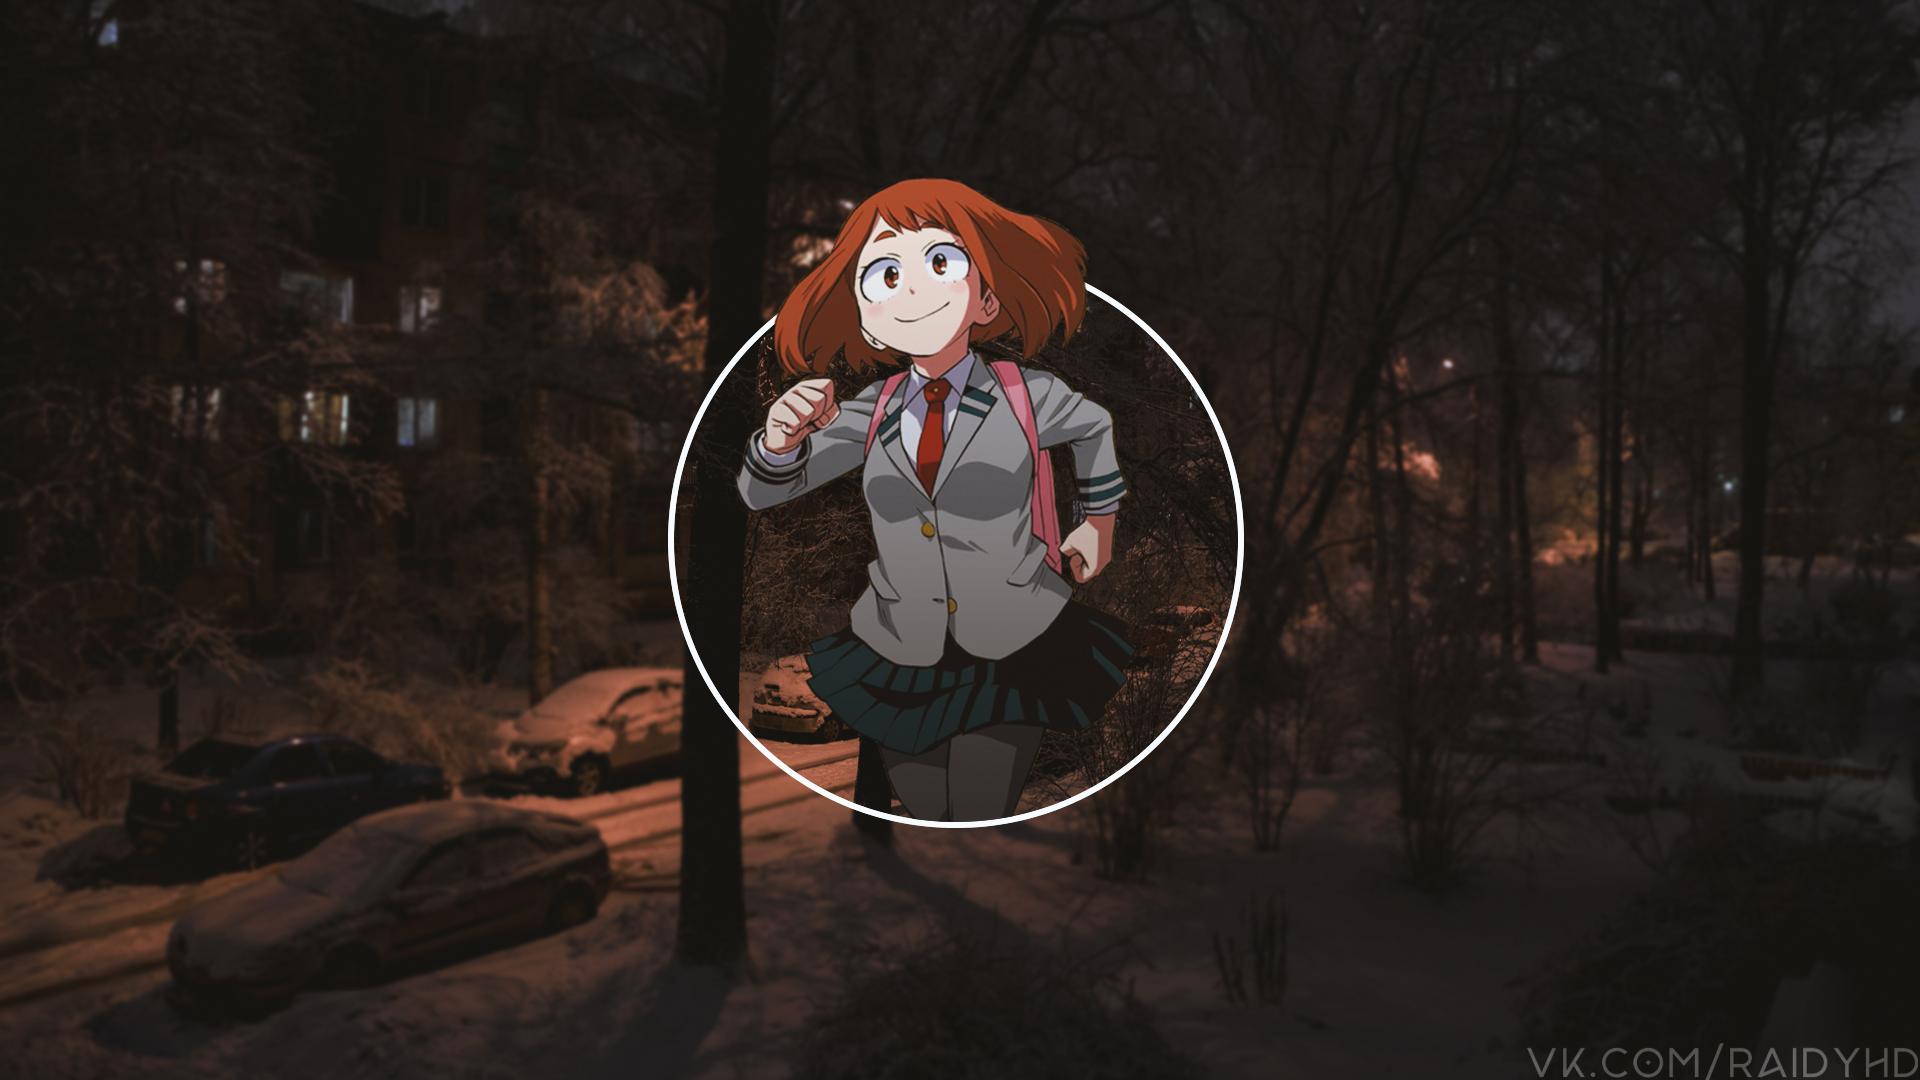 Anime 1920x1080 anime anime girls picture-in-picture Boku no Hero Academia Uraraka Ochako